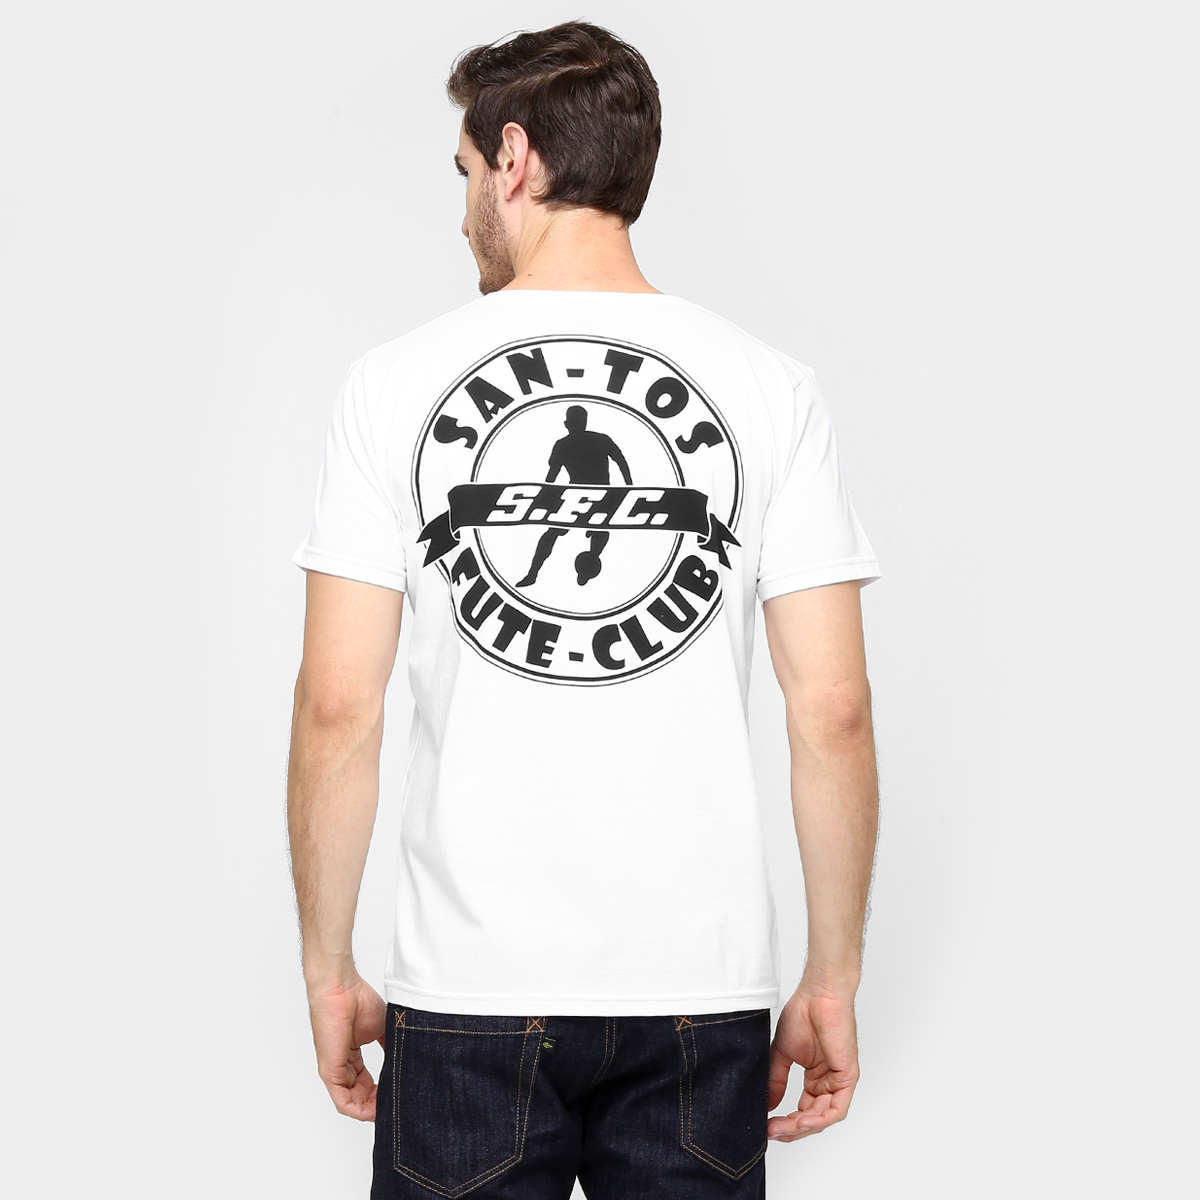 Camisa Santos simples 1904 MELEX